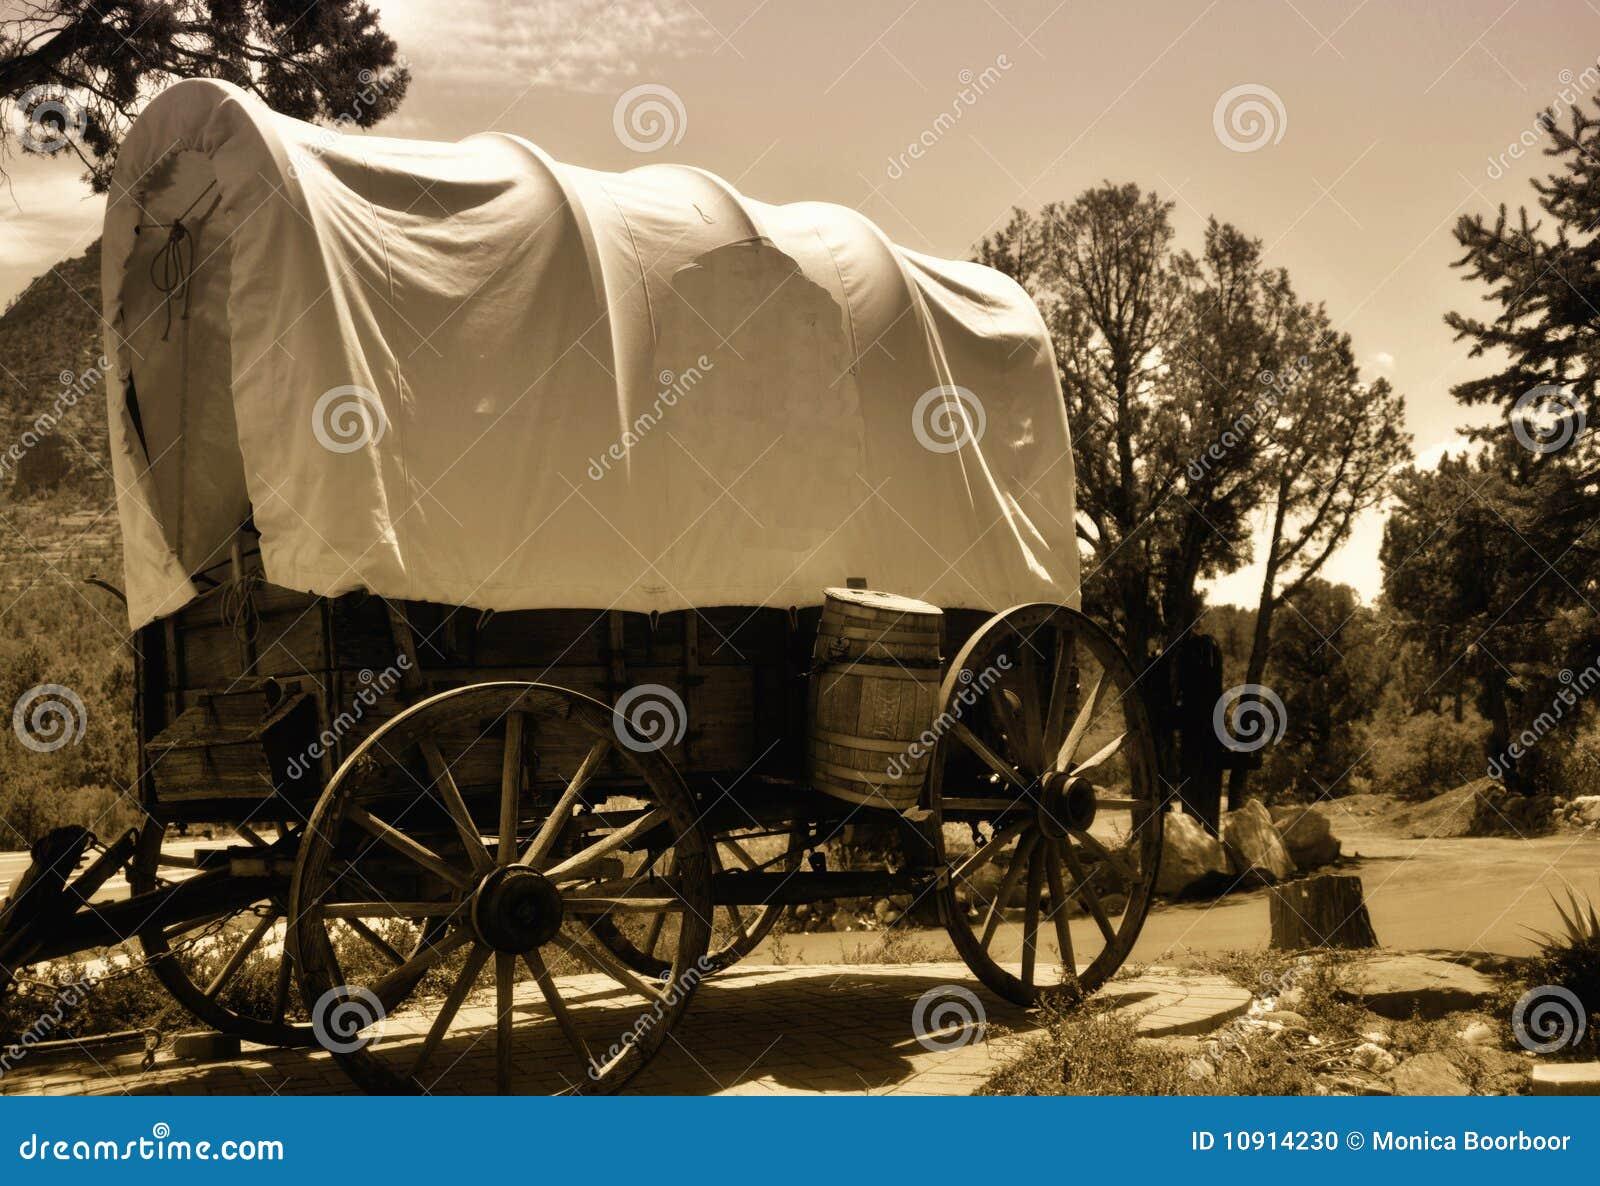 Home Decor Covered Wagon